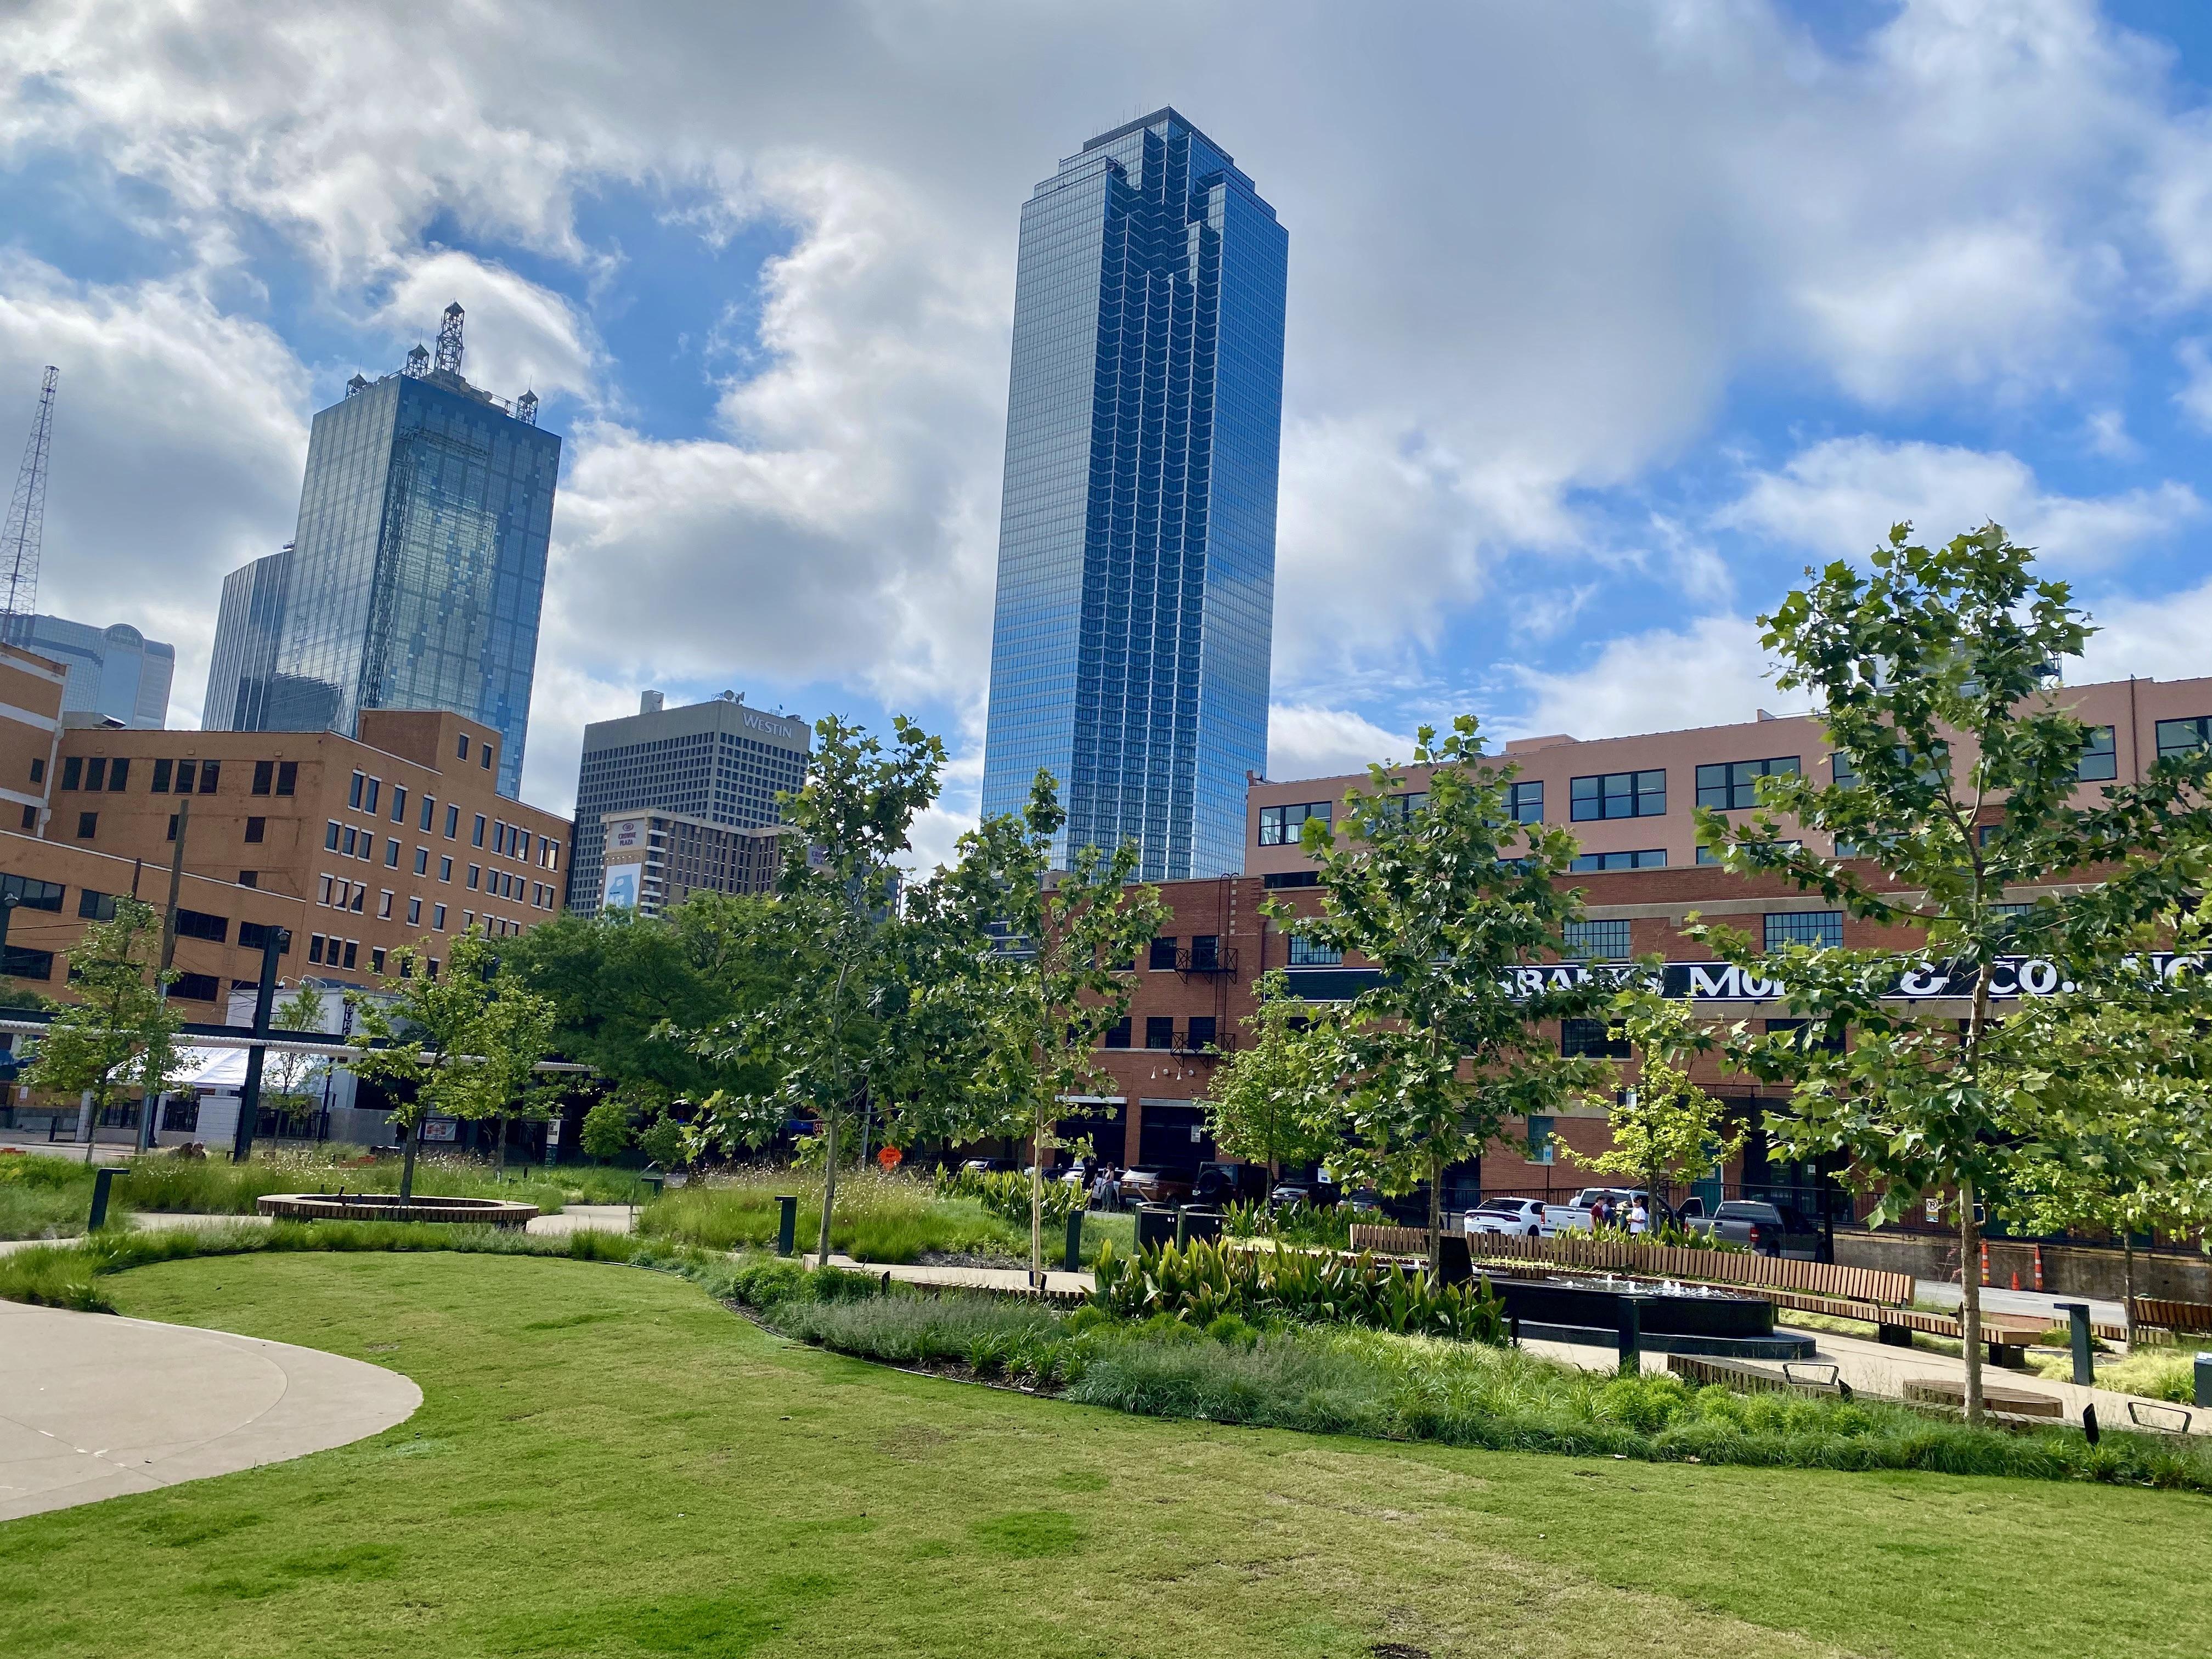 Park near West End Square in Dallas, TX